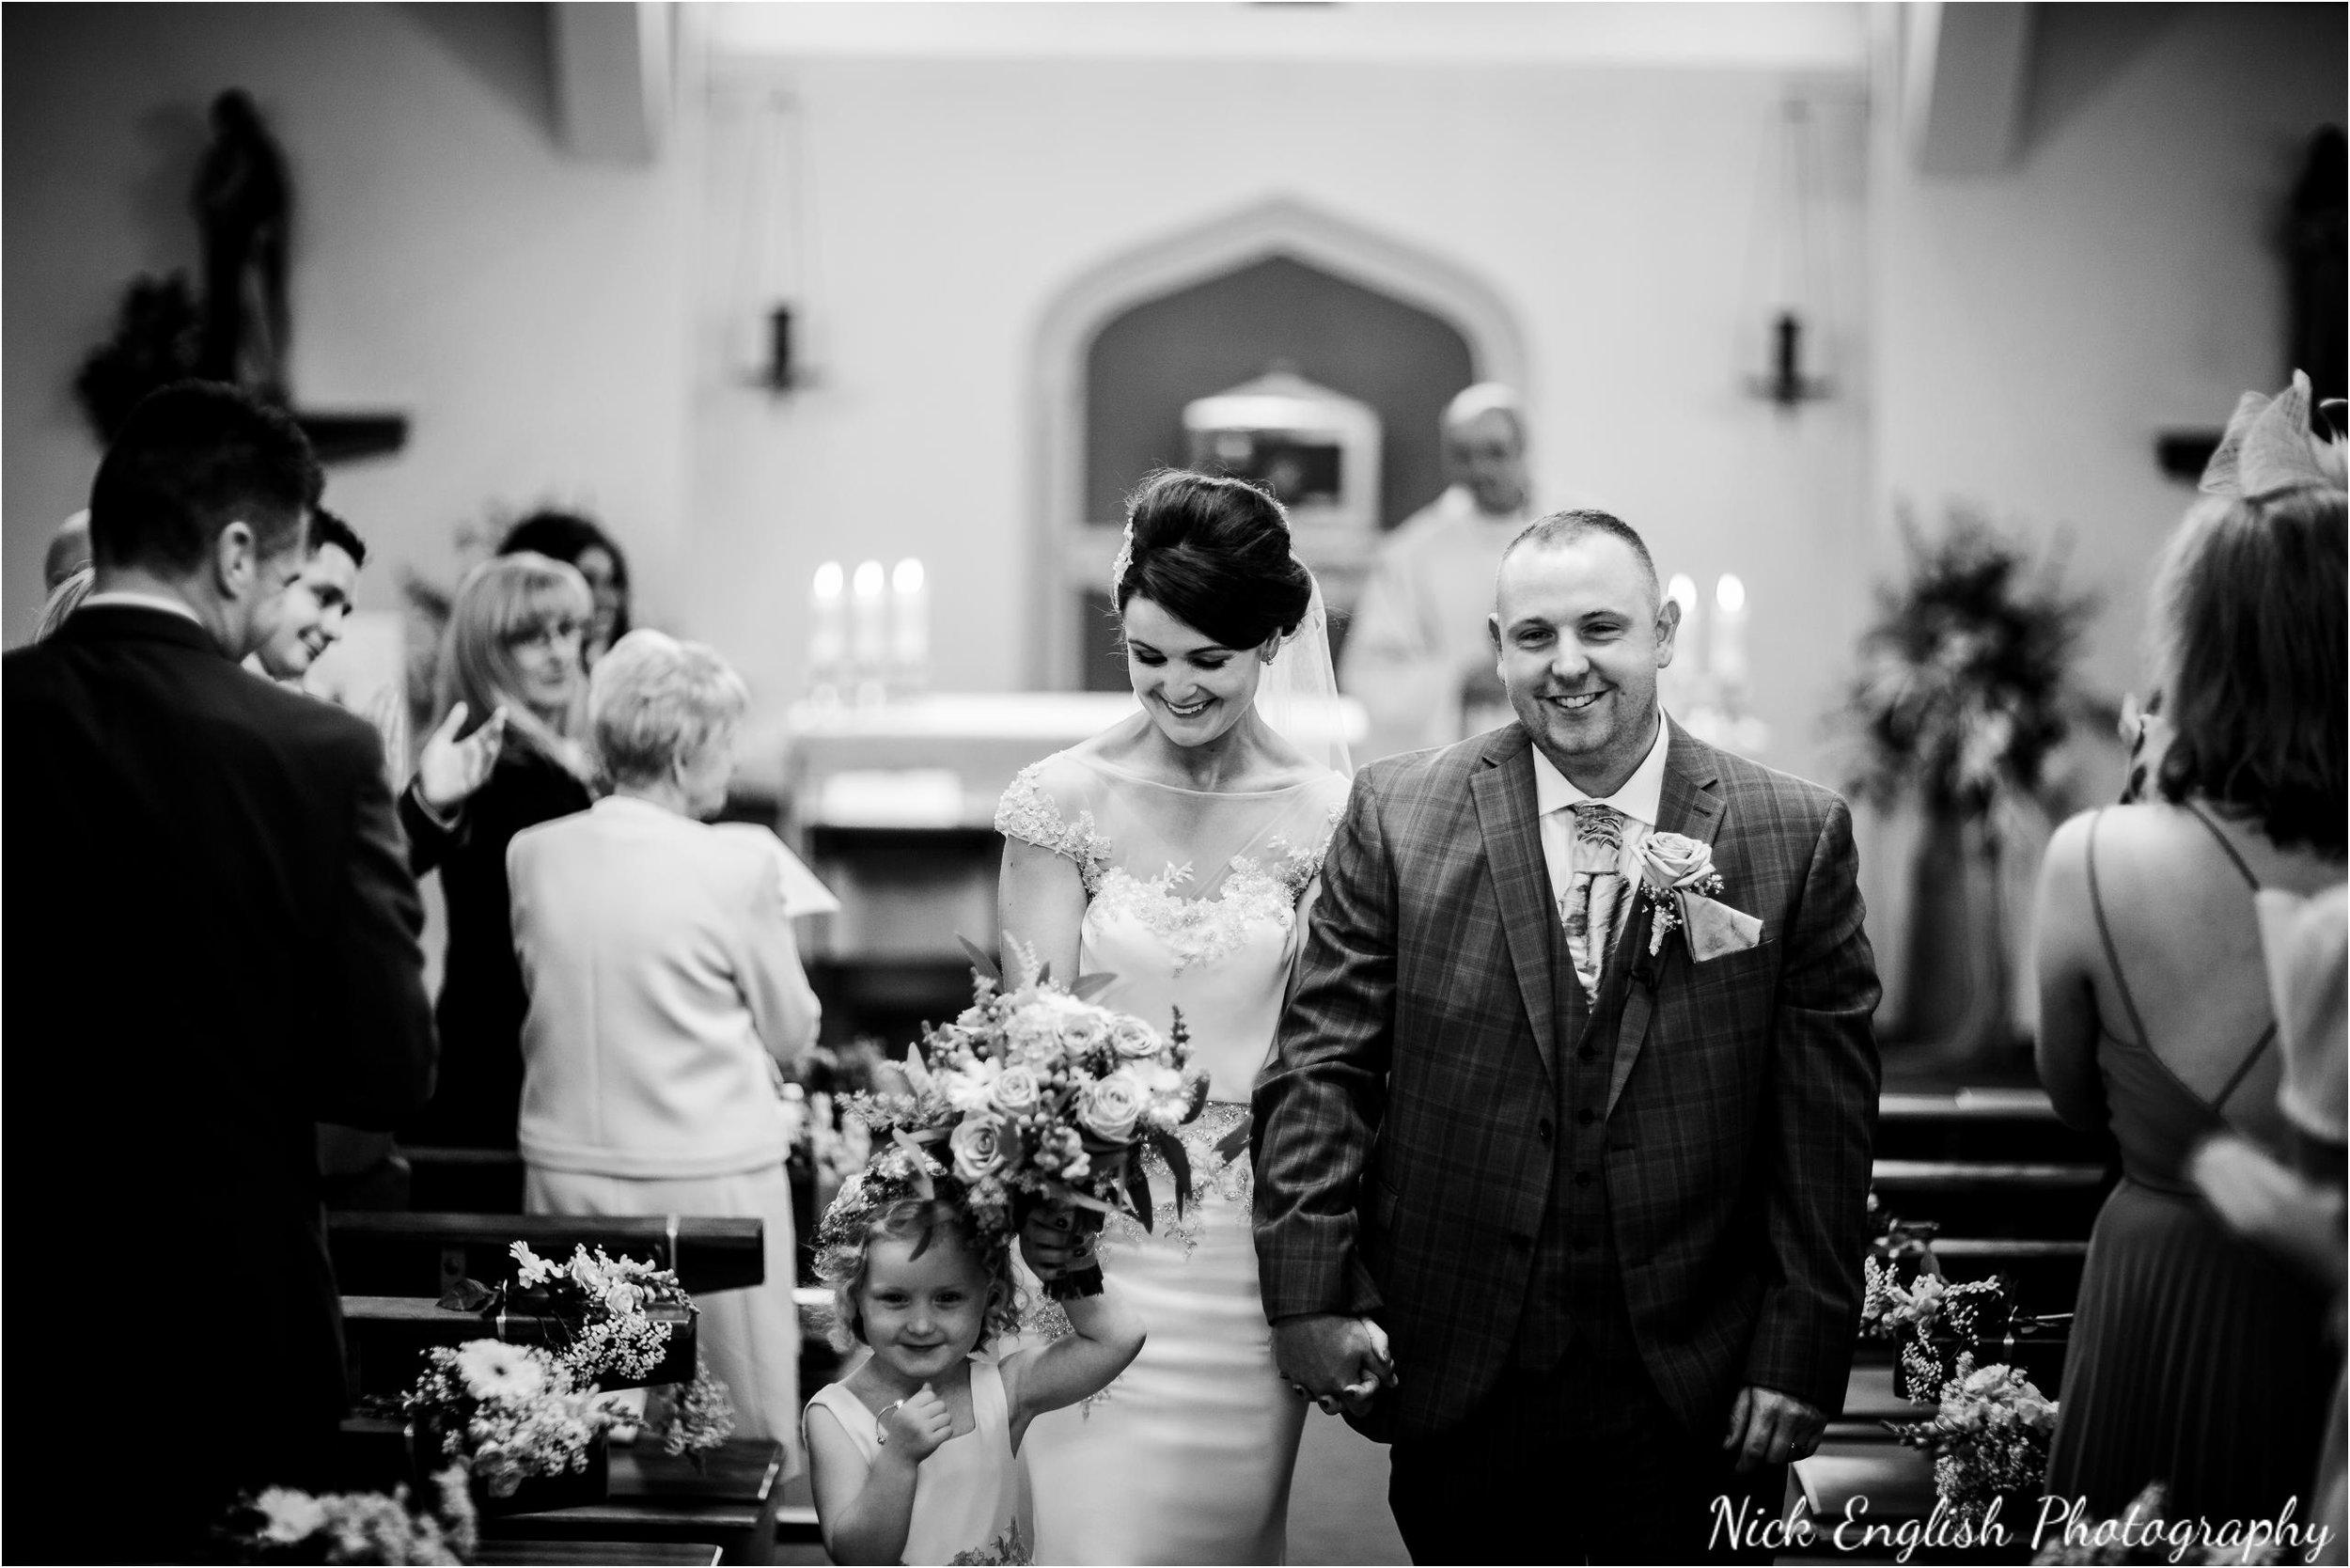 Stacey-Ash-Wedding-Photographs-Stanley-House-Preston-Lancashire-83.jpg